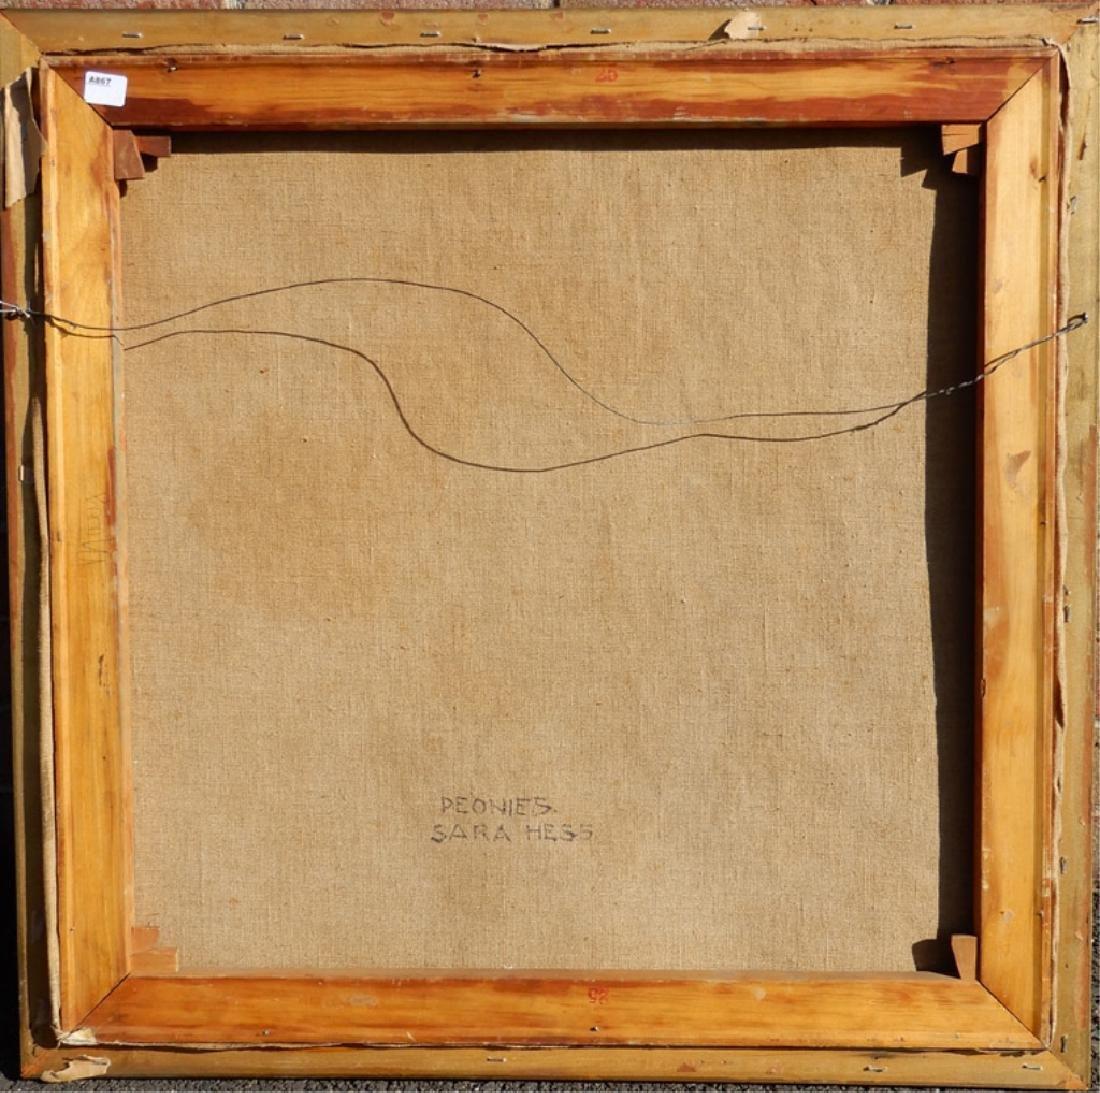 Sara (Mae) Hess oil on canvas - 4